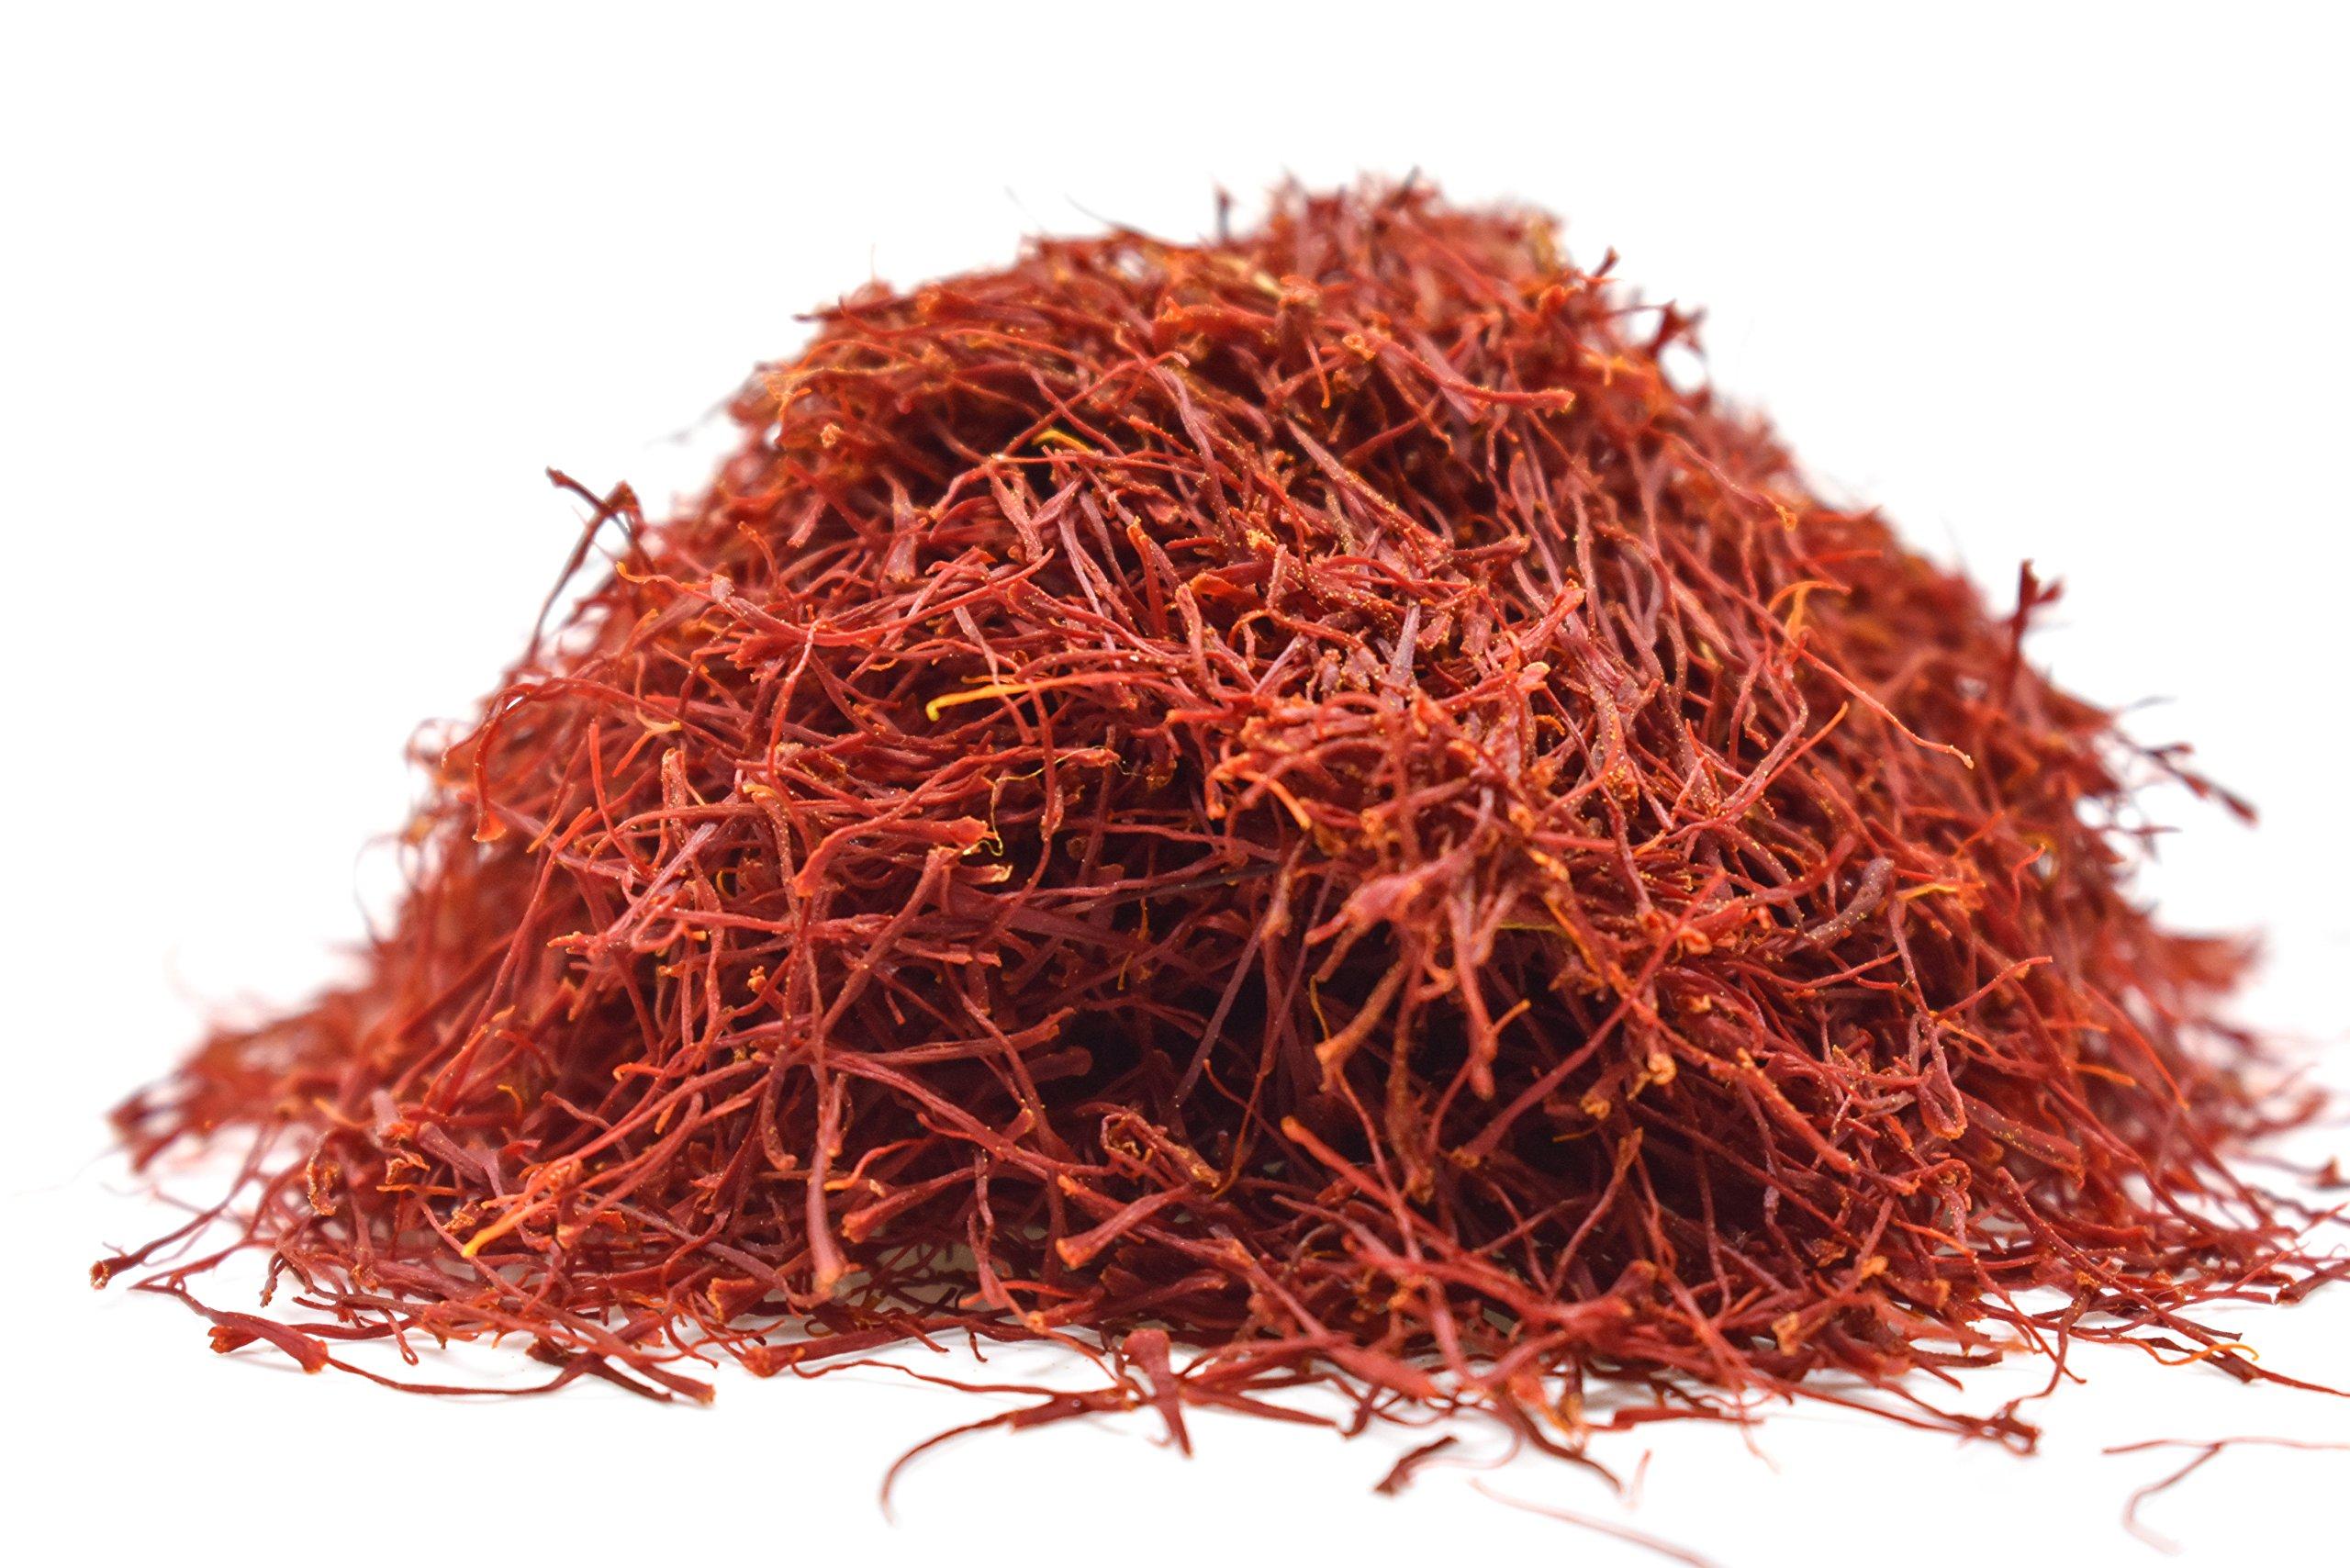 Persian Saffron Threads by Slofoodgroup Premium Quality Saffron Threads, All Red Saffron Filaments (various sizes) Grade I Saffron (5 grams saffron) by Slofoodgroup (Image #3)